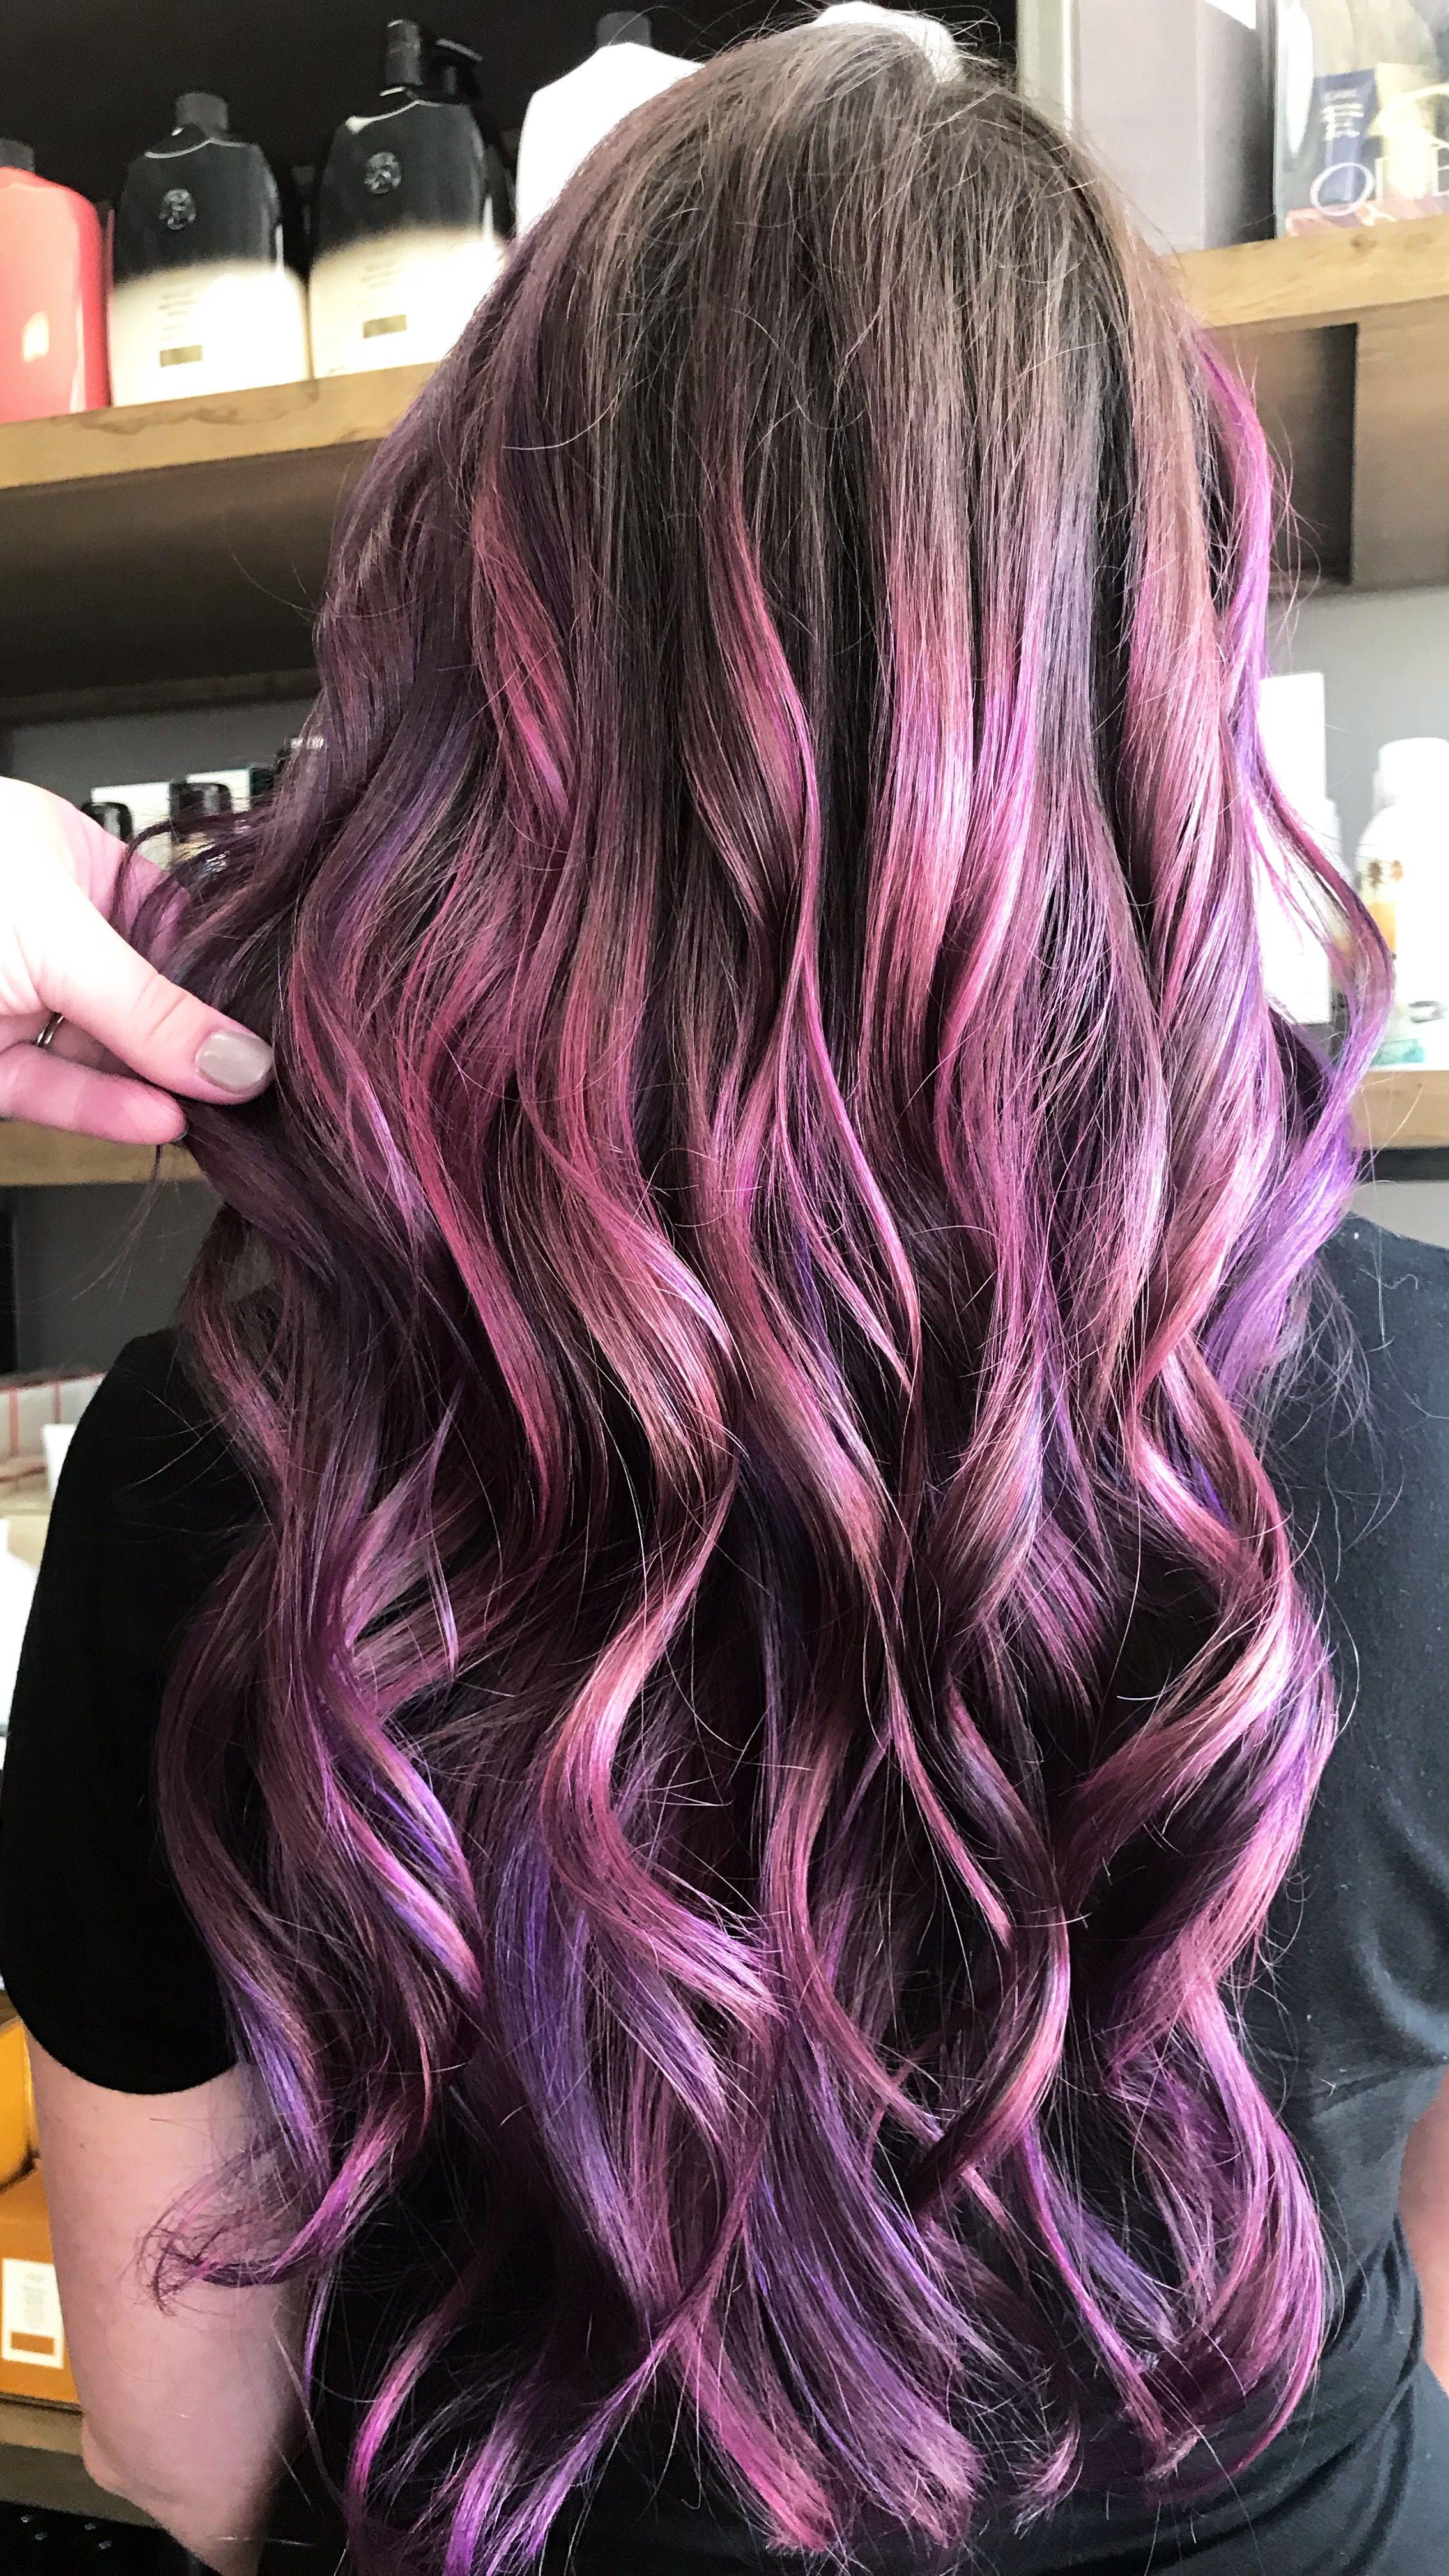 Painted purple by mjhairartistry hurrr dewzz pinterest